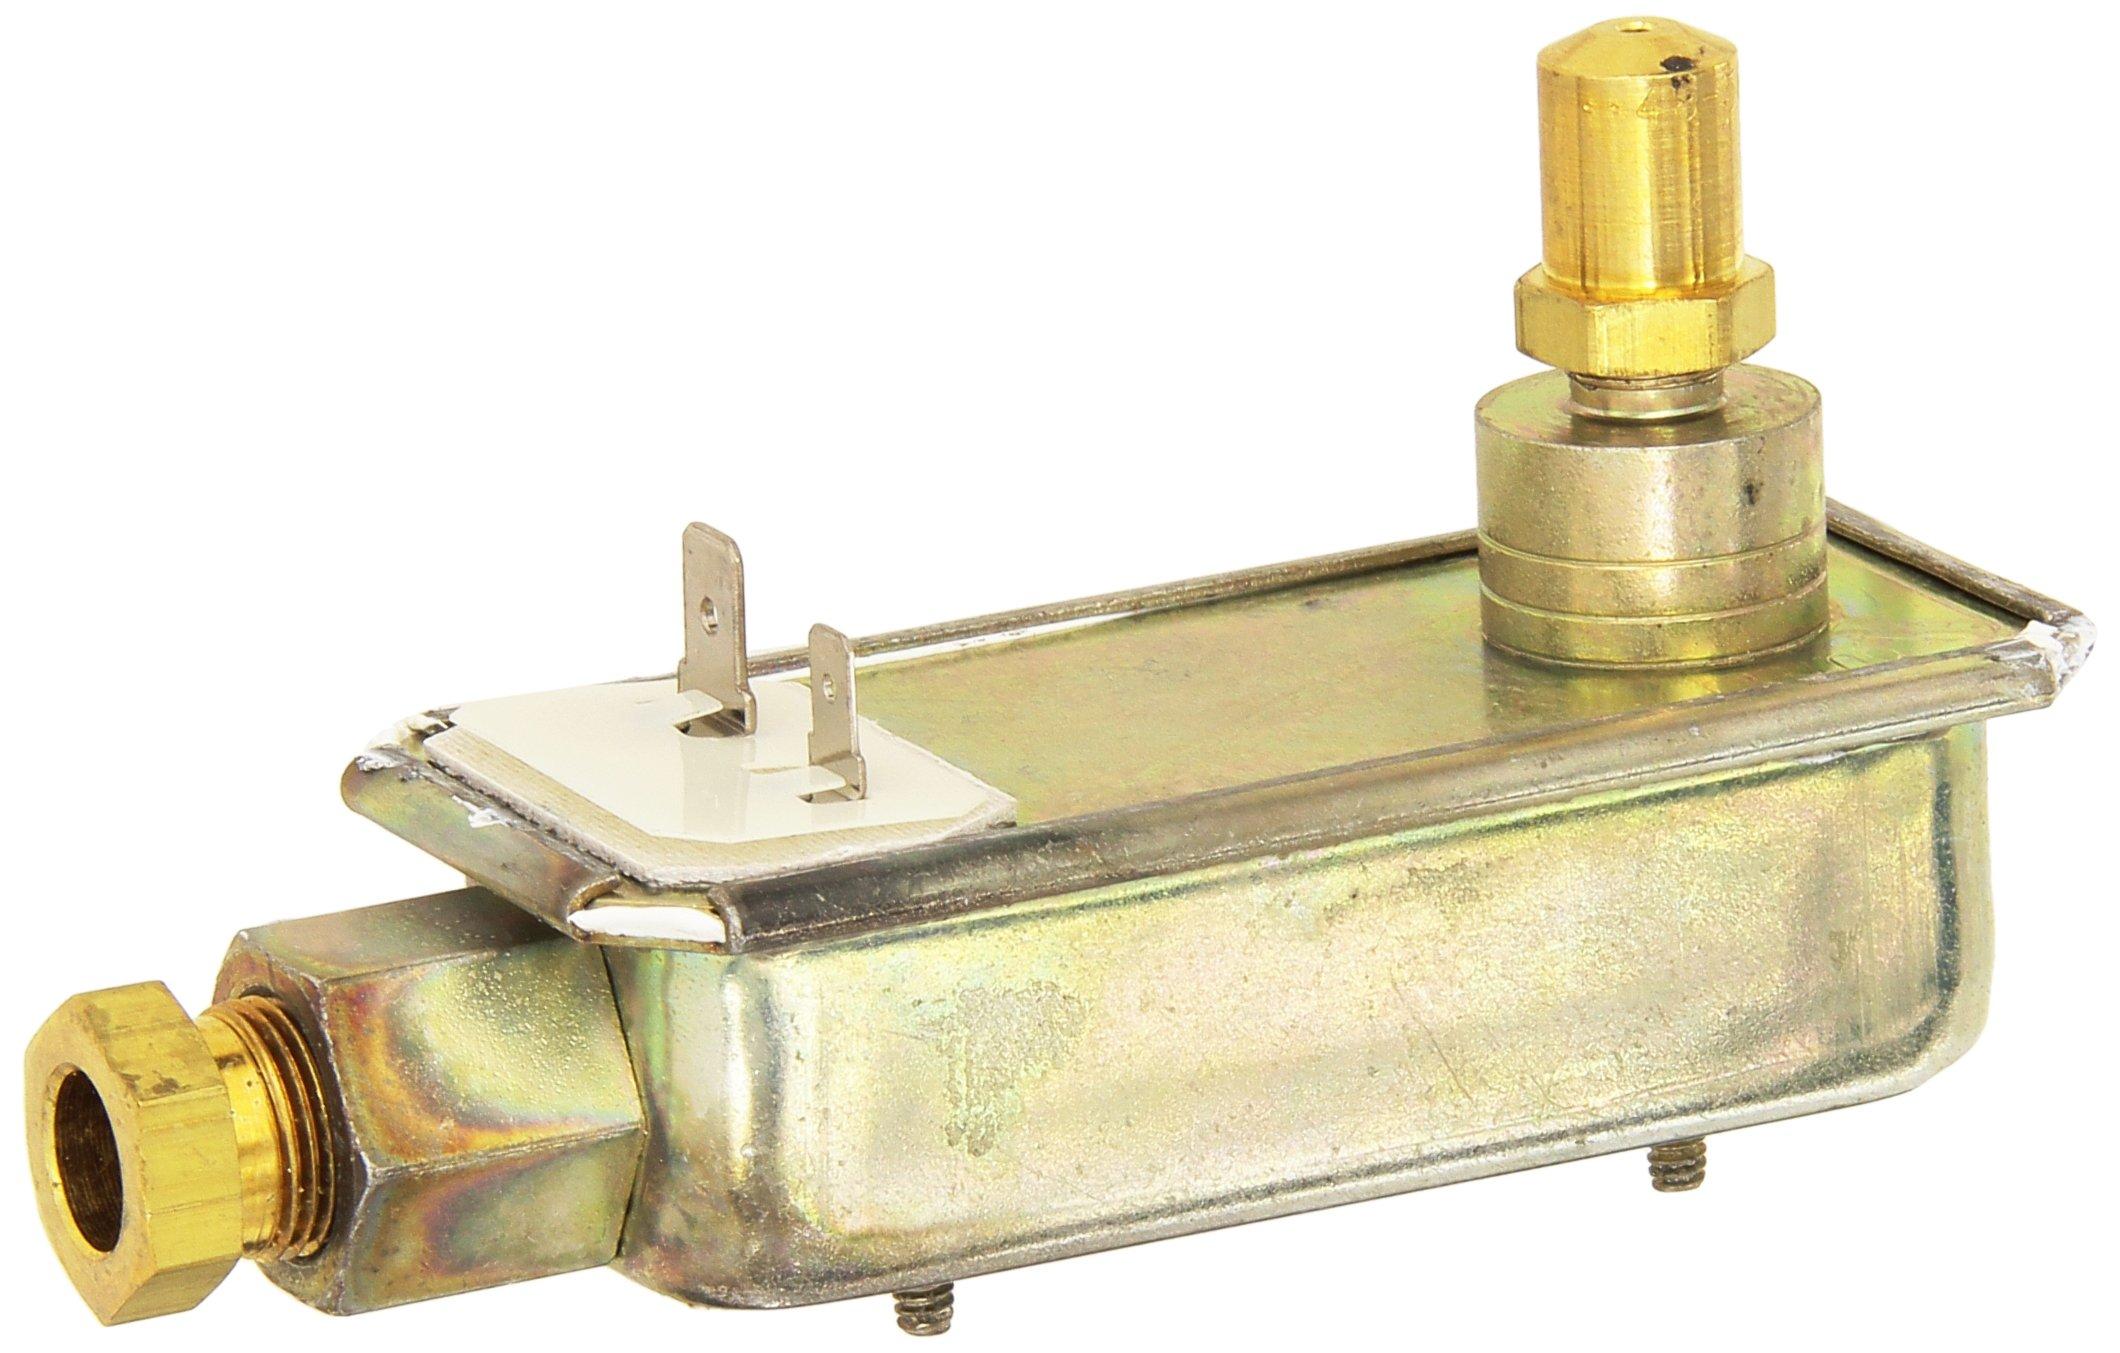 Frigidaire 318087200 Range/Stove/Oven Oven Safety Valve